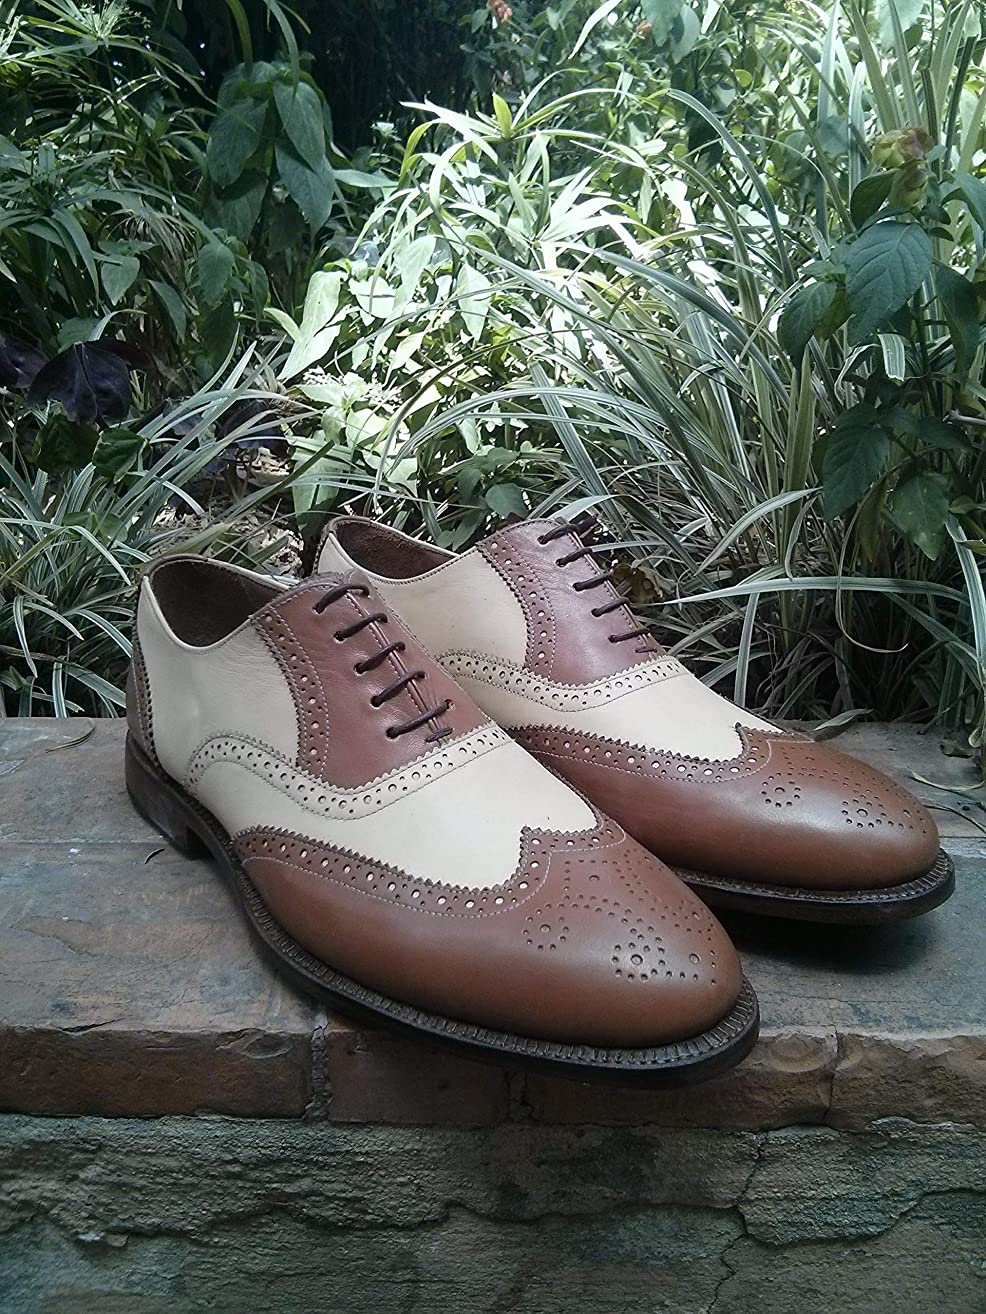 Handmade Correspondents Wingtip Oxfords For Men Custom Made Shoes for Men